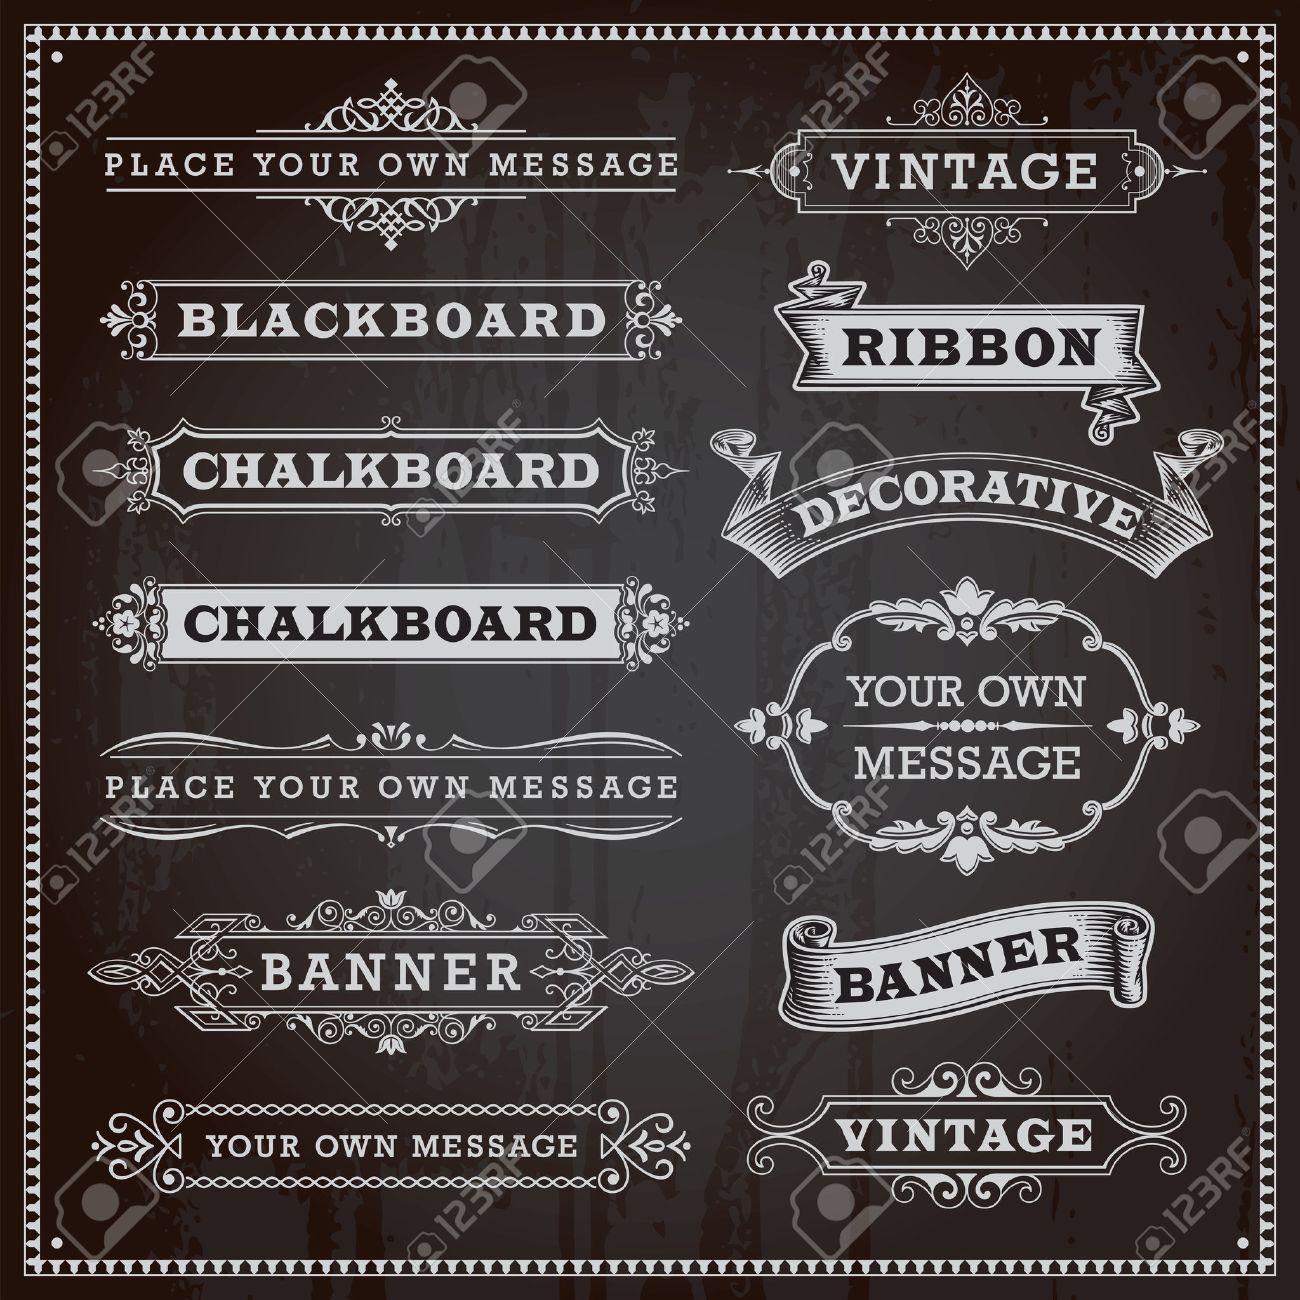 Vintage design elements Stock Vector - 27948192